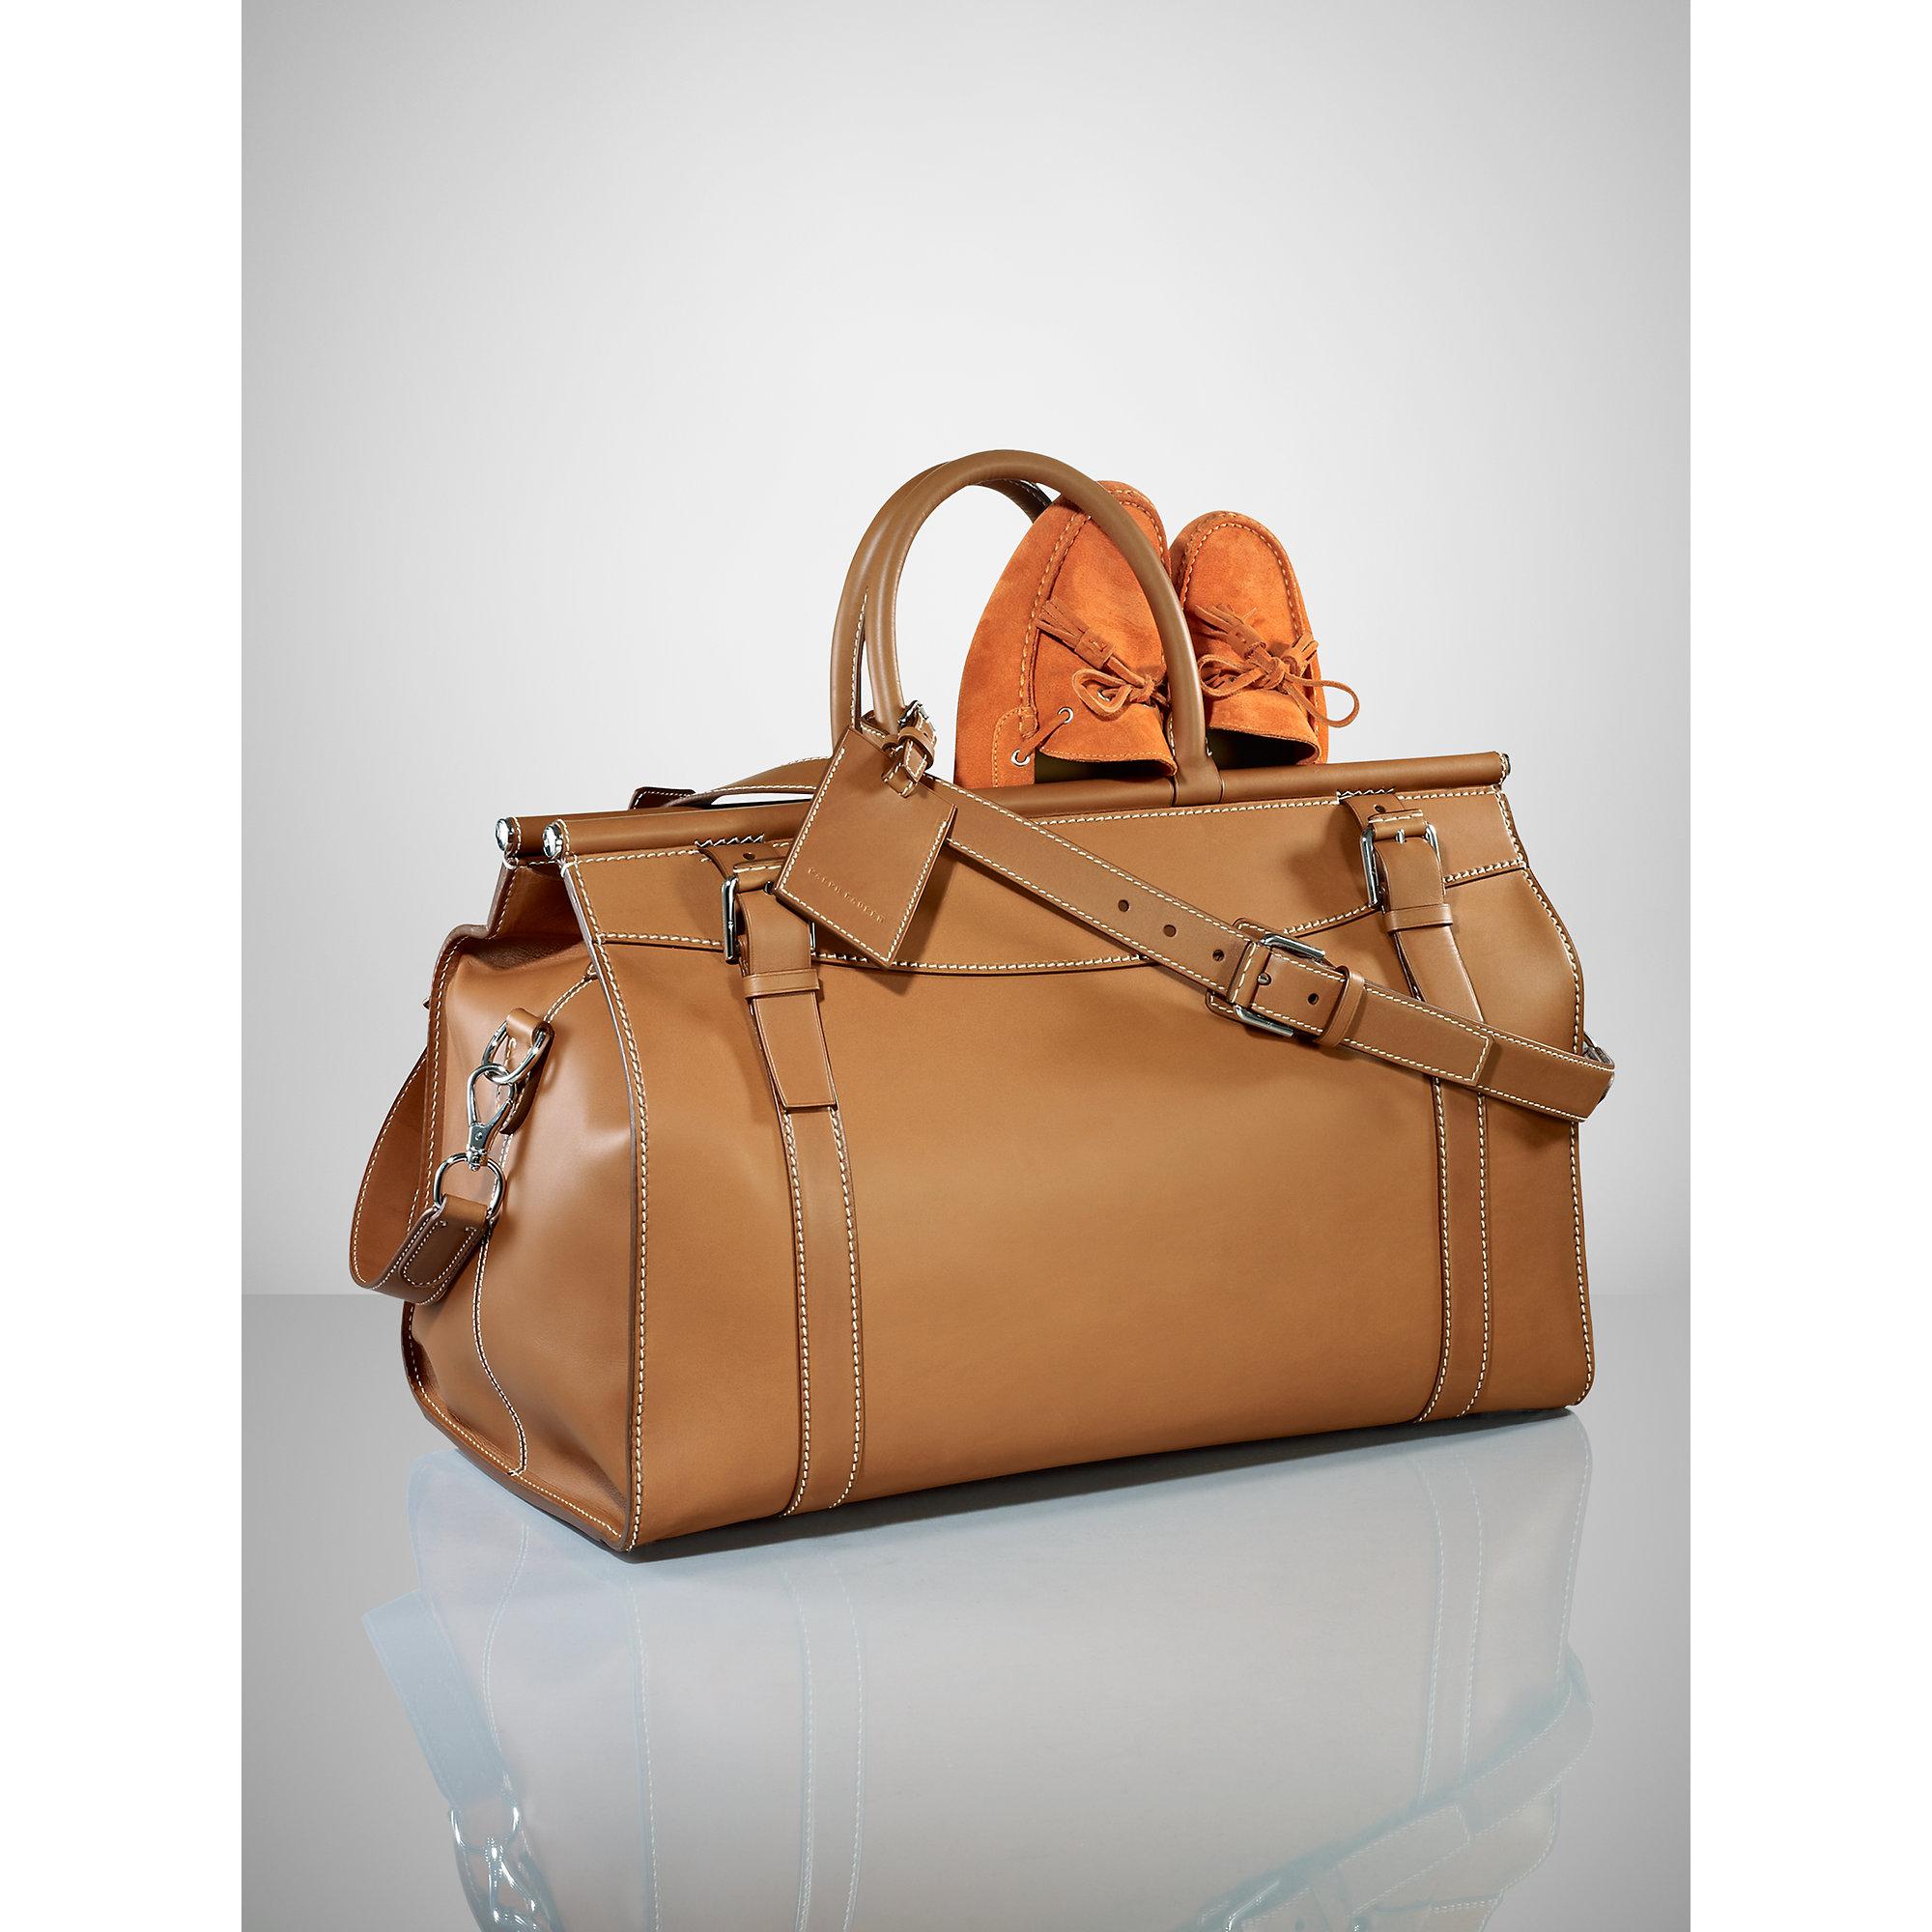 Lyst - Pink Pony Saddle Weekender Bag in Metallic for Men 3e530b1ae6db8